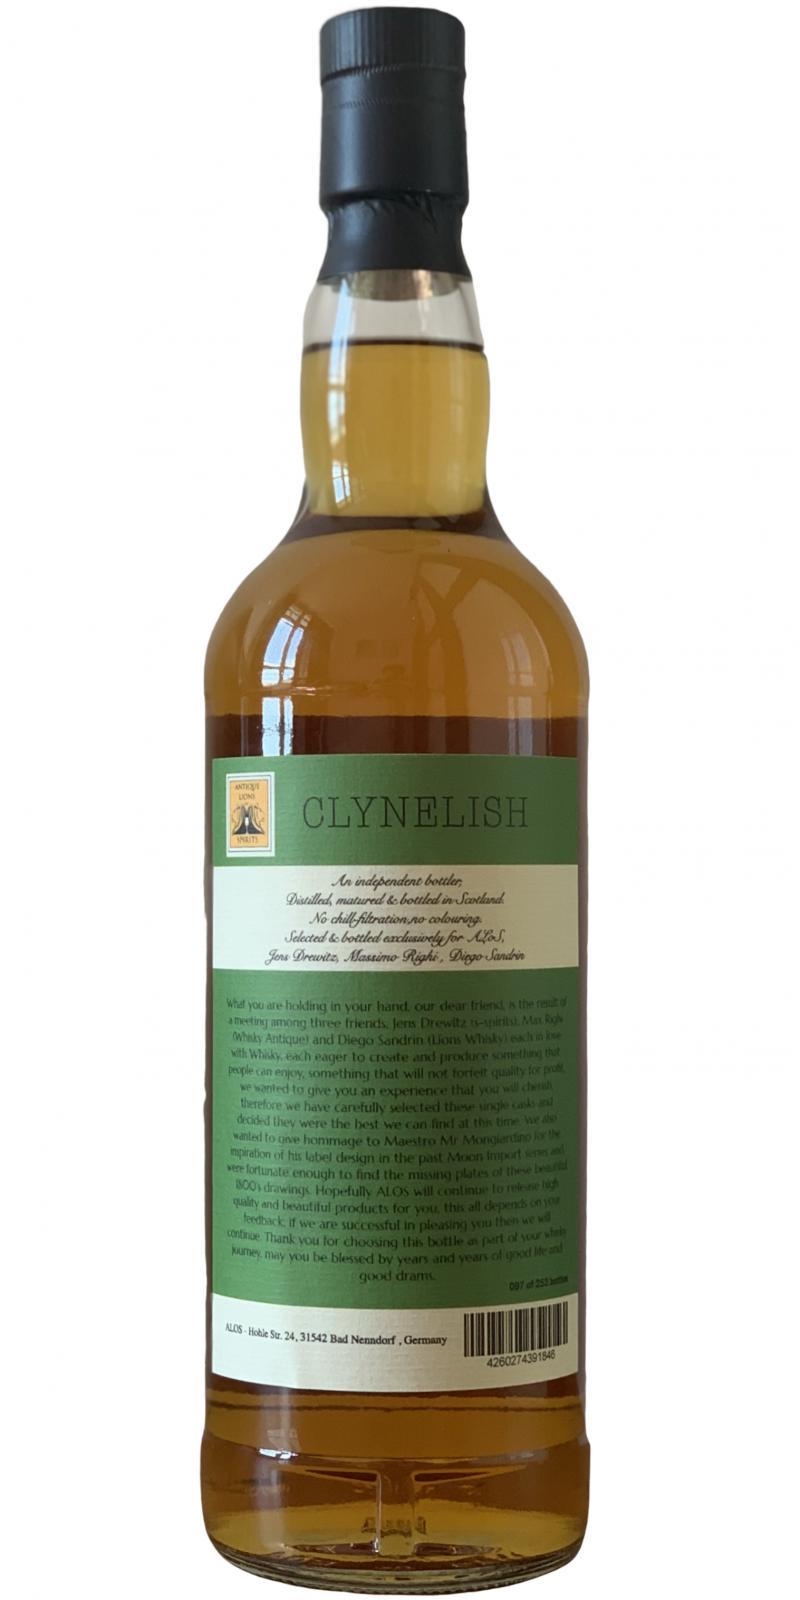 Clynelish 1997 ALOS